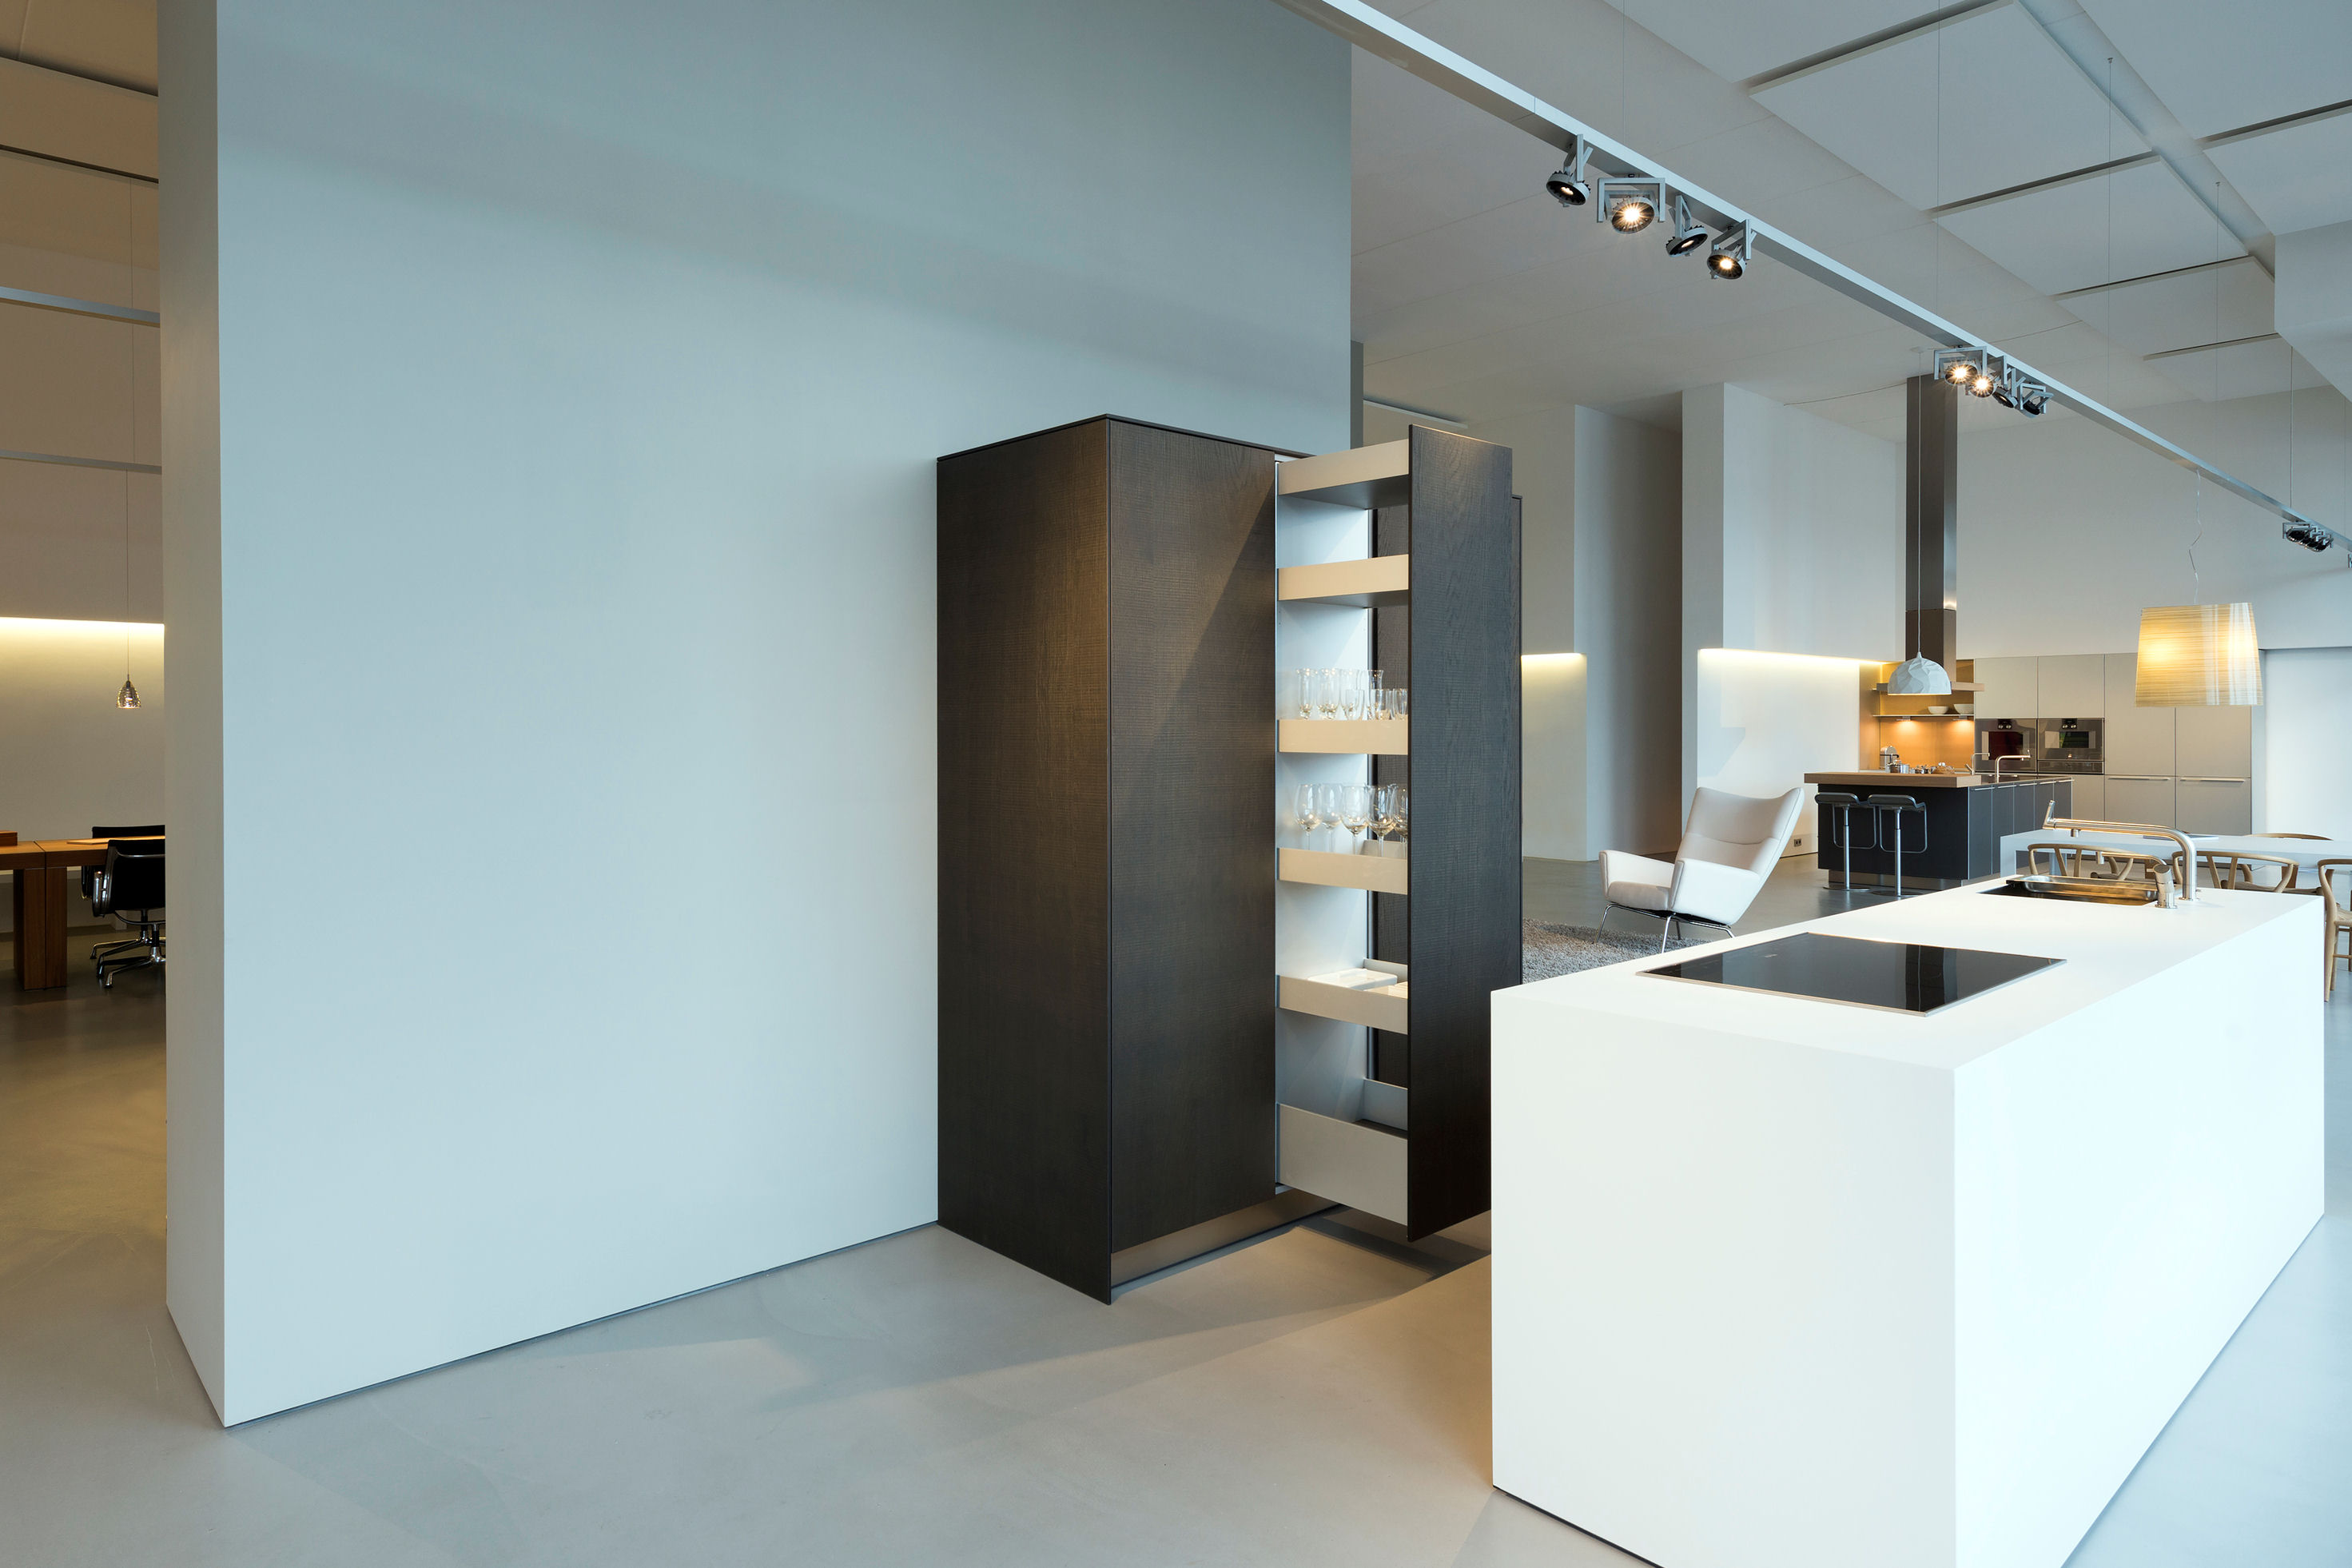 Bulthaup onderdelen bestellen u keukenarchitectuur